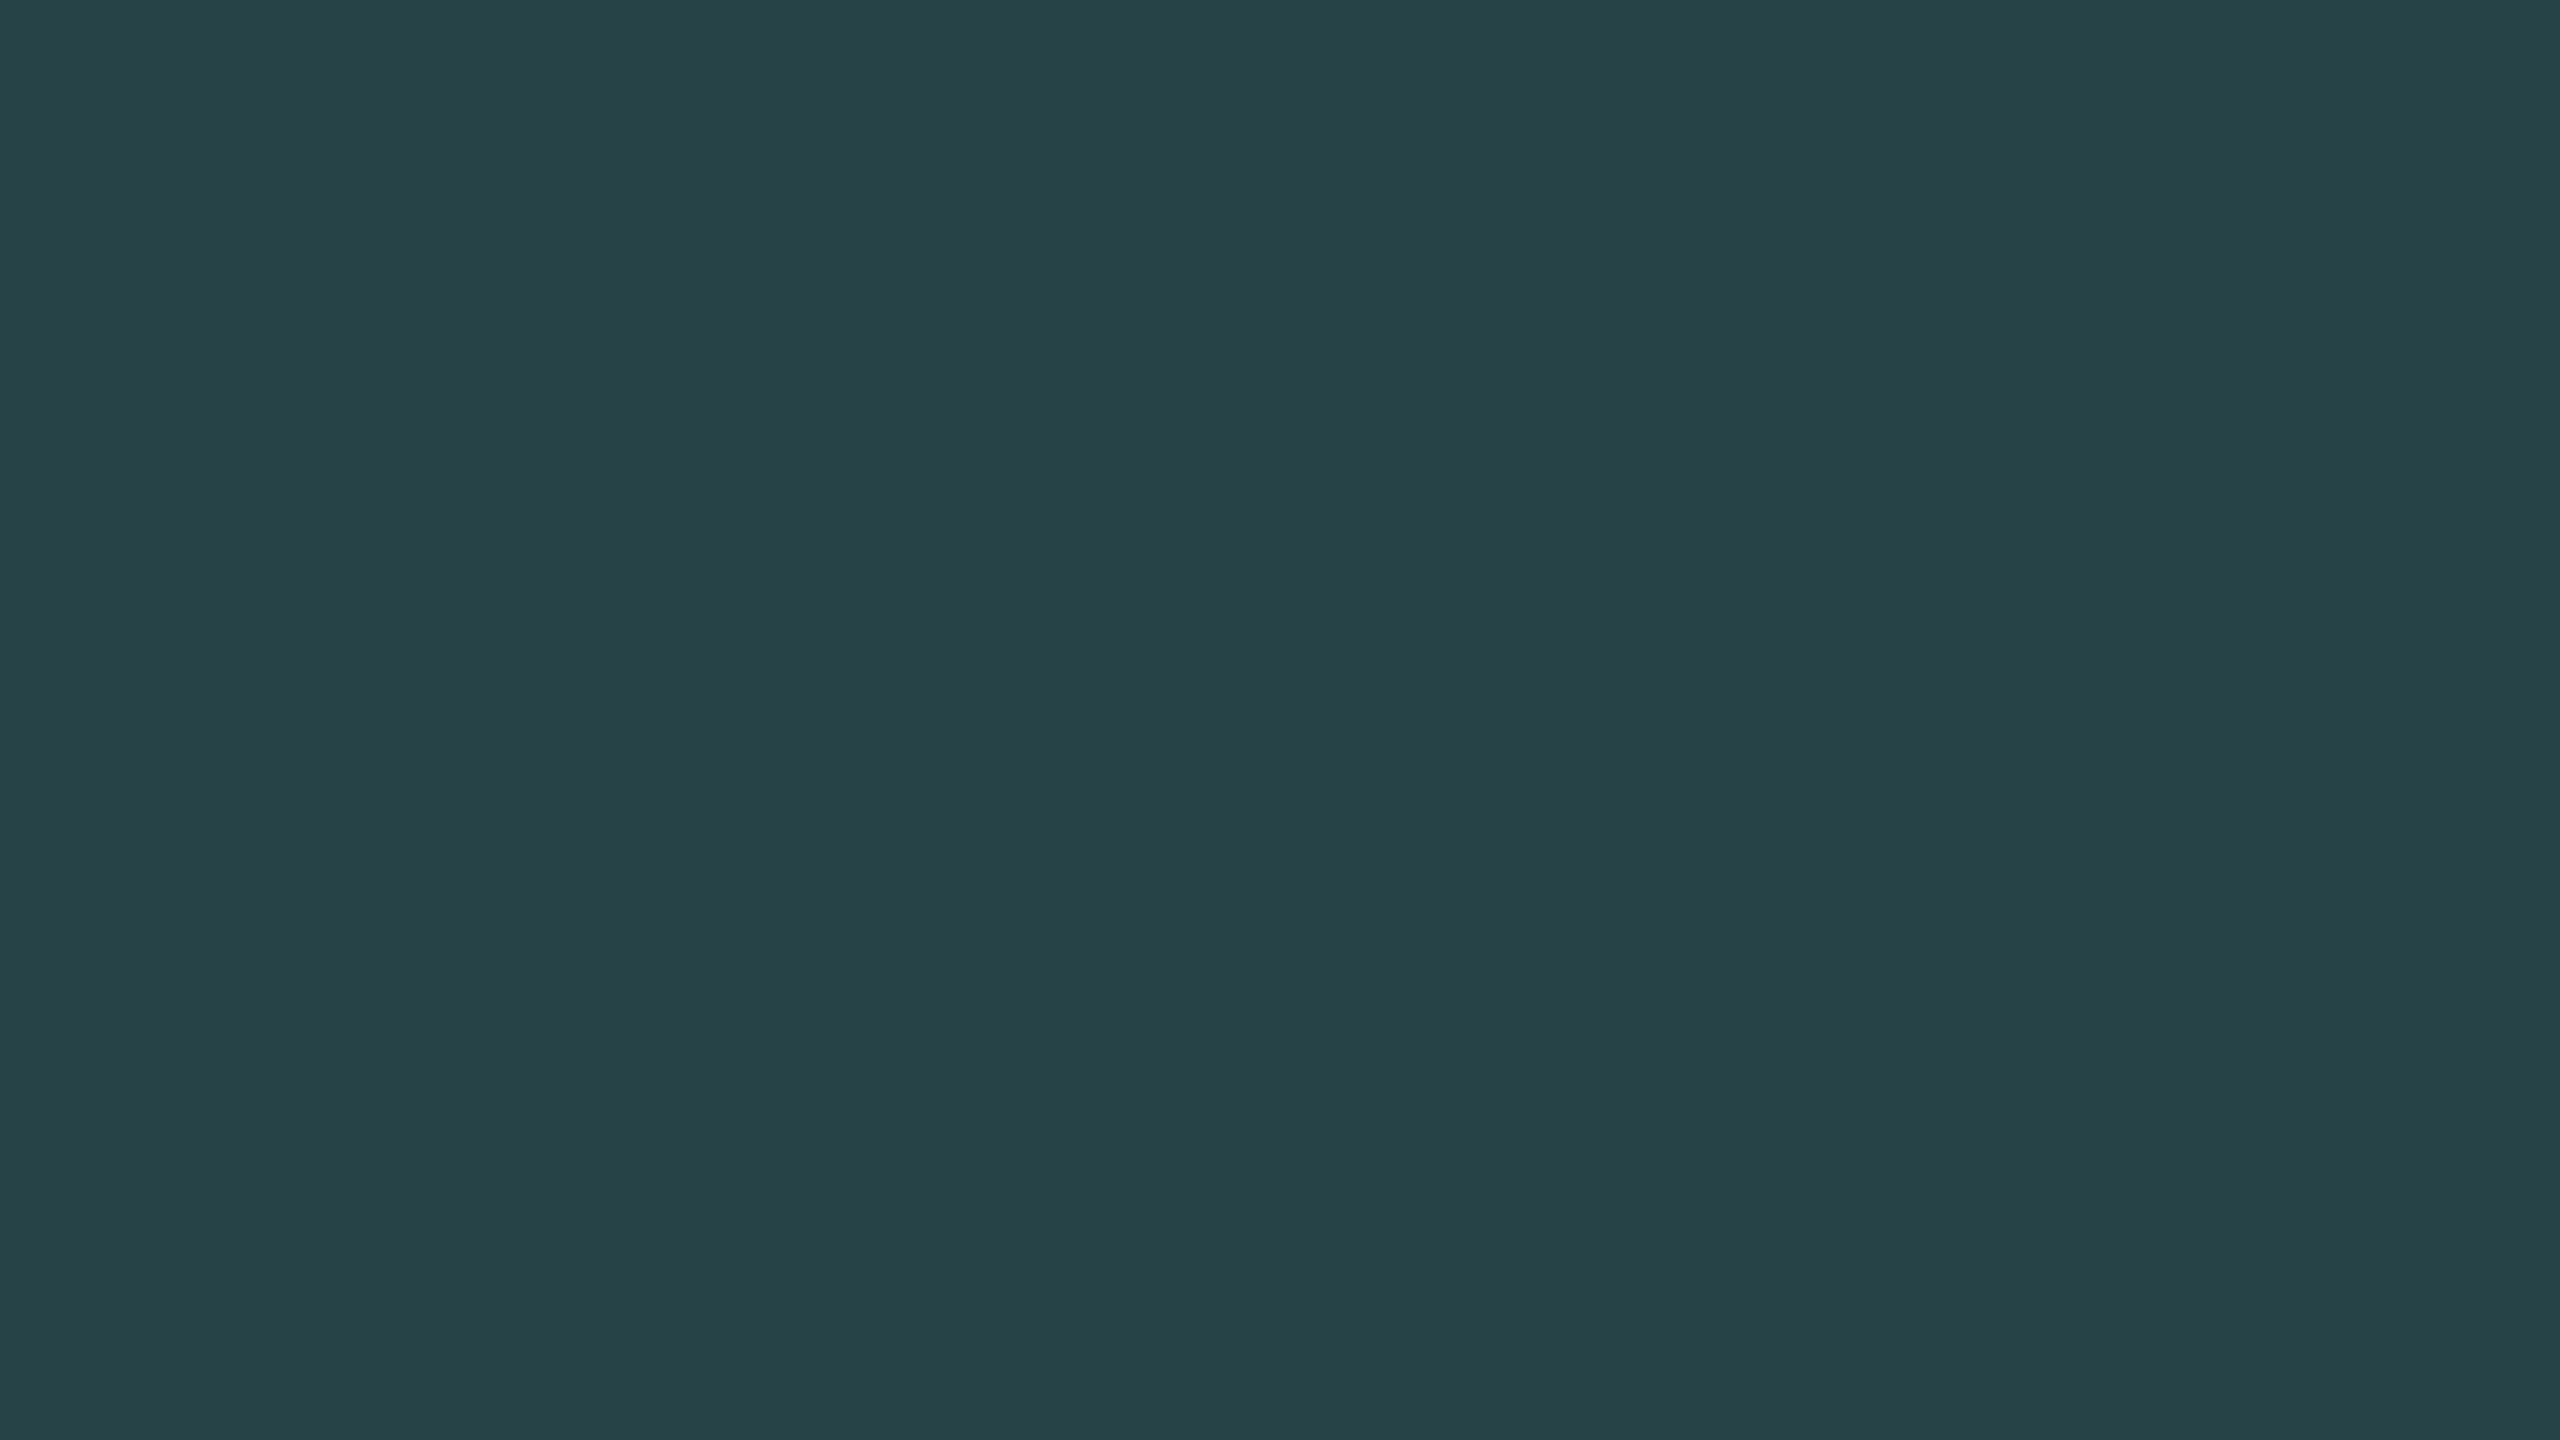 2560x1440 Japanese Indigo Solid Color Background